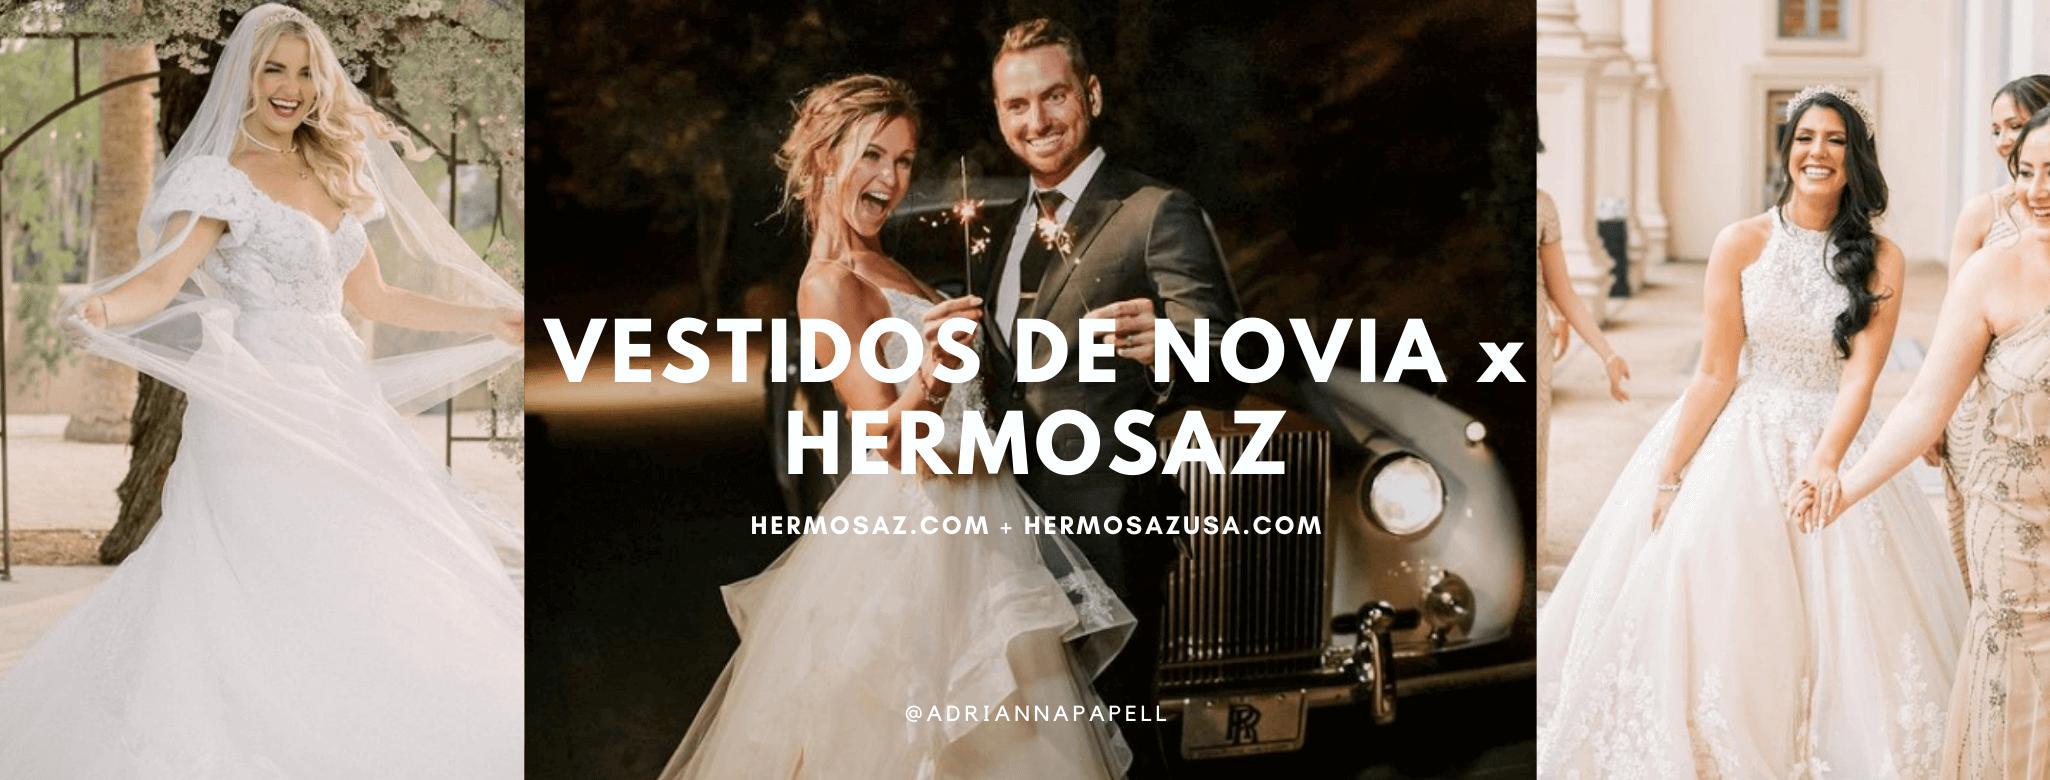 Vestidos de novia x Hermosaz